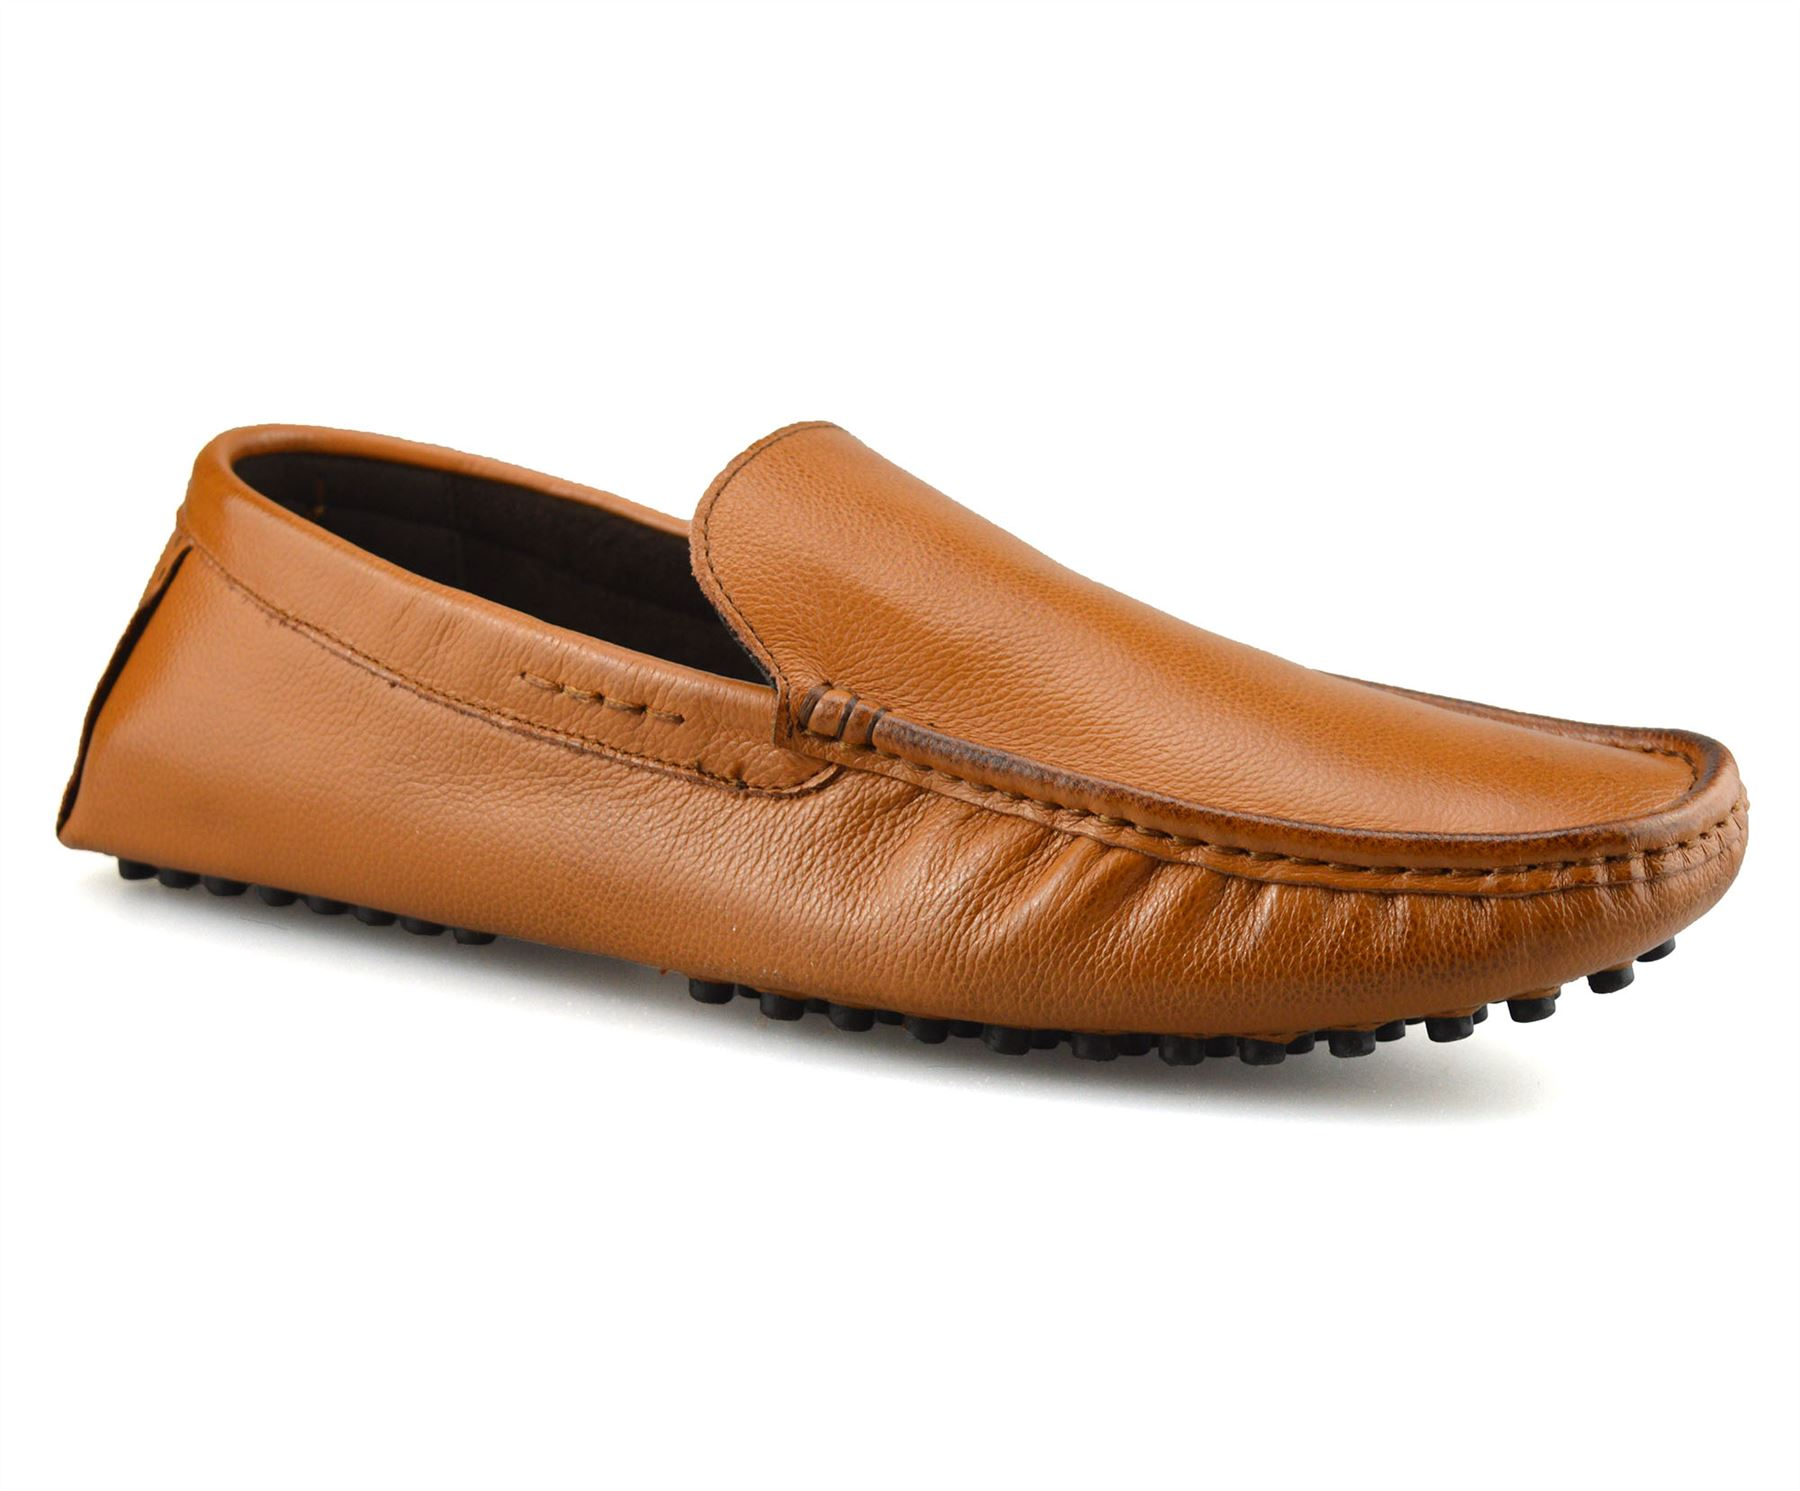 Homme-en-Cuir-Slip-On-Casual-Smart-Mocassins-Mocassin-Homme-Conduite-Chaussures-Taille miniature 10